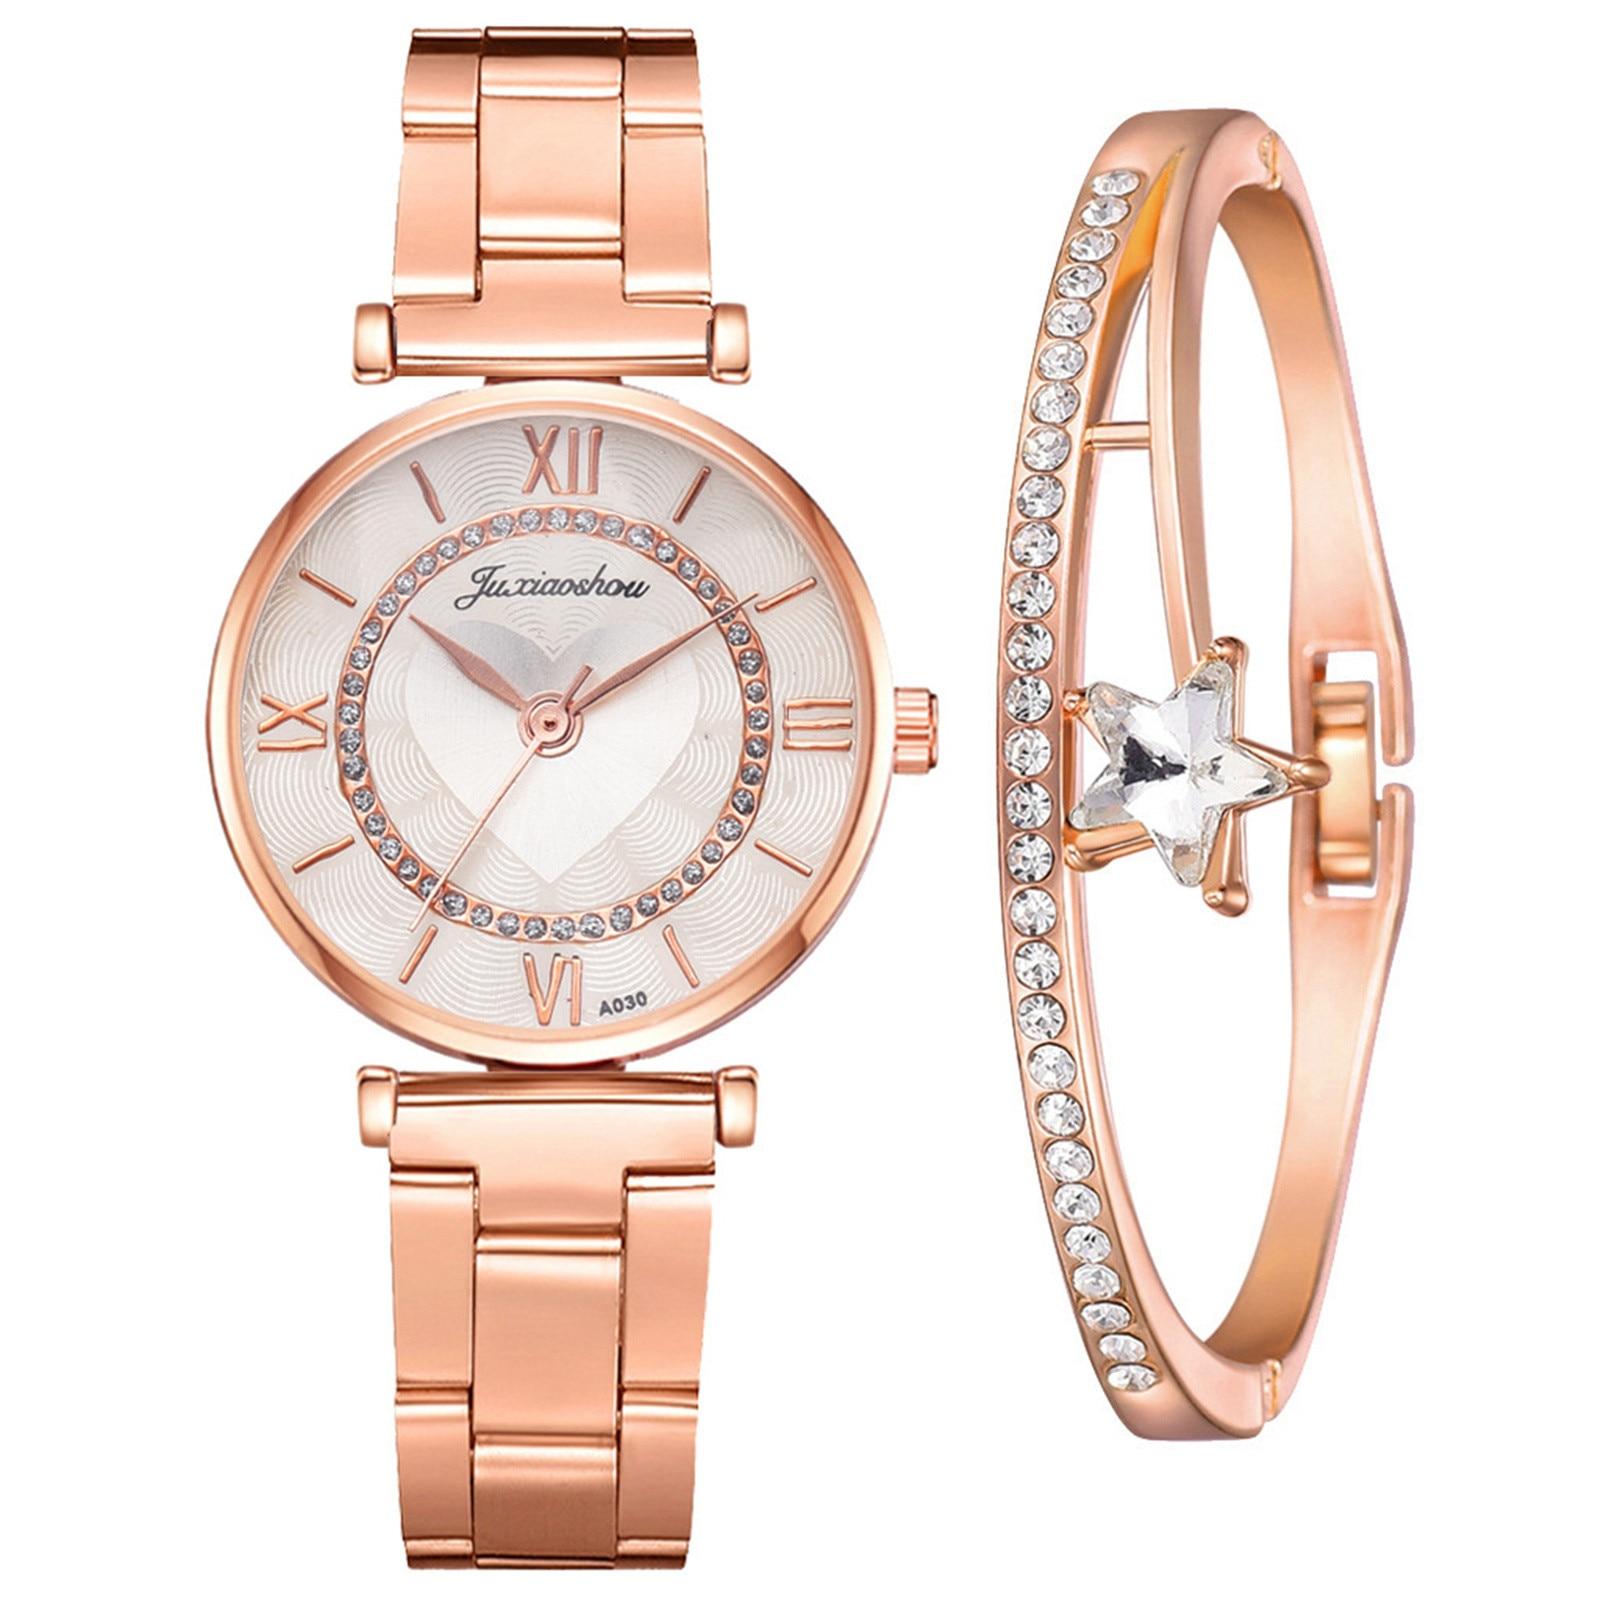 HOT Women's Fashion Luxury Watches Quartz Watch Stainless Steel Dial Casual Bracelet Wristwatches La